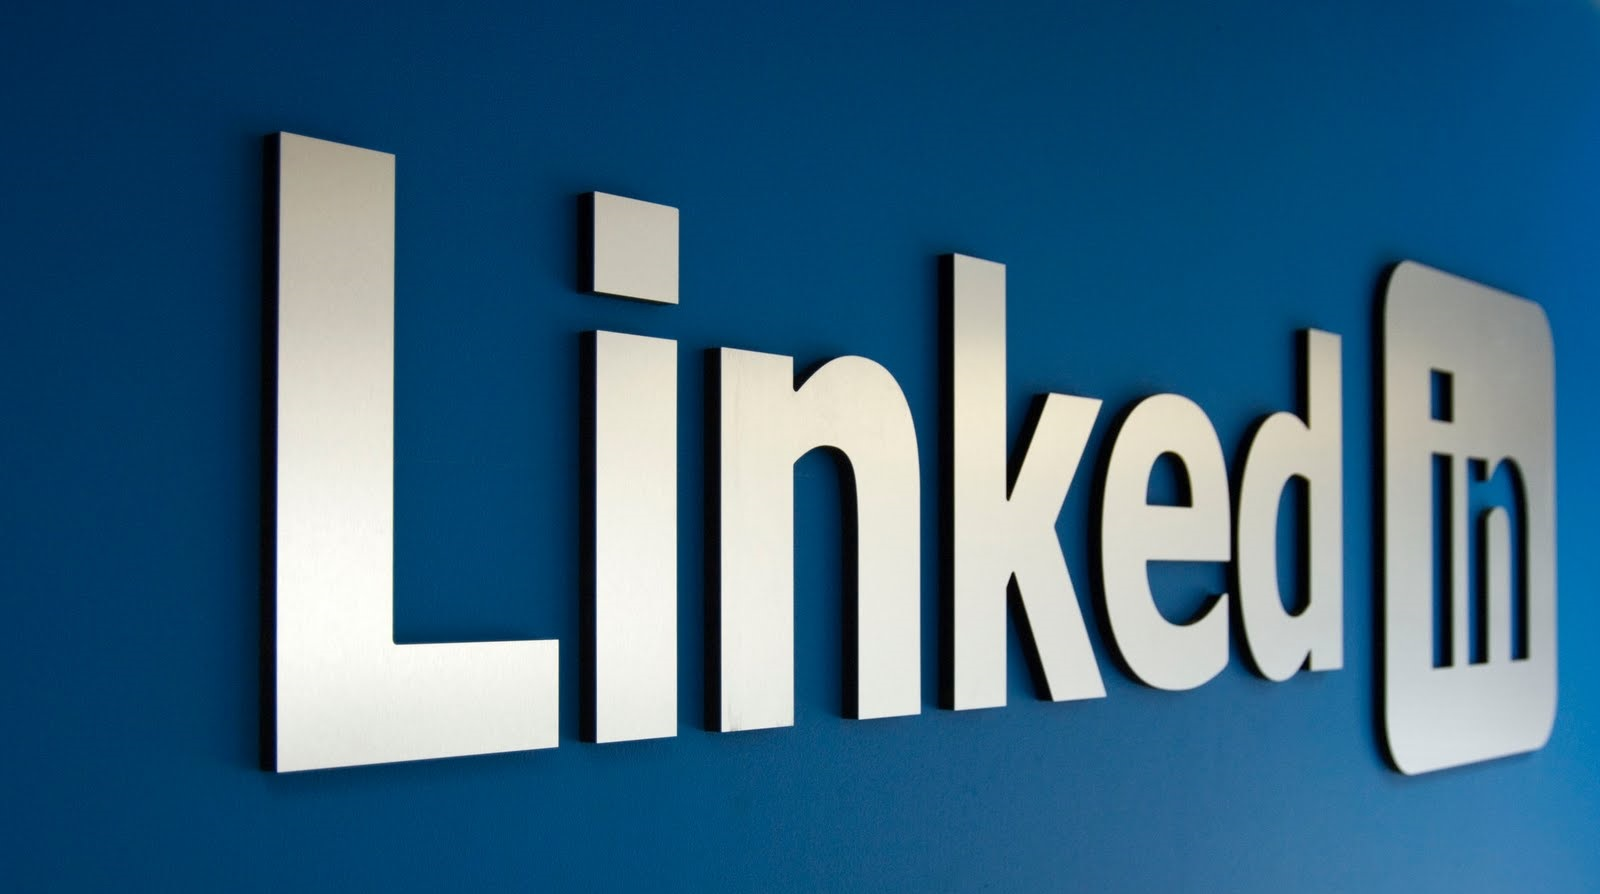 logo portalu LinkedIn